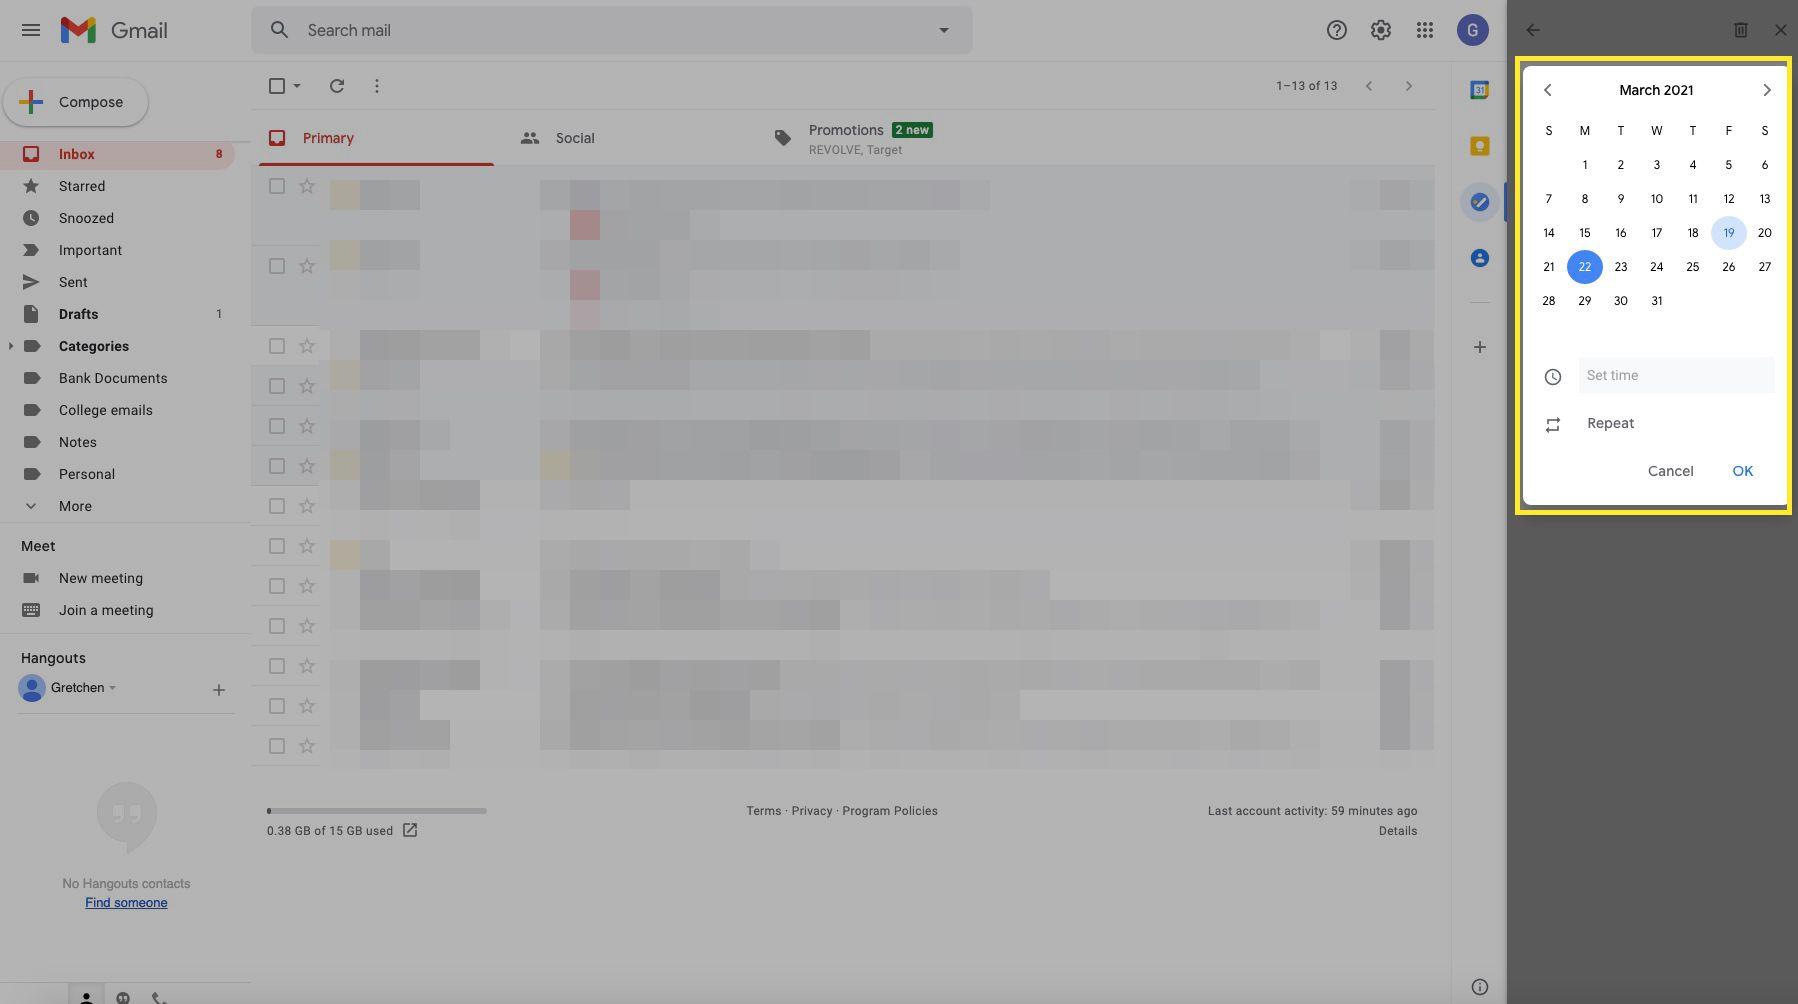 Google task with calendar/date highlighted